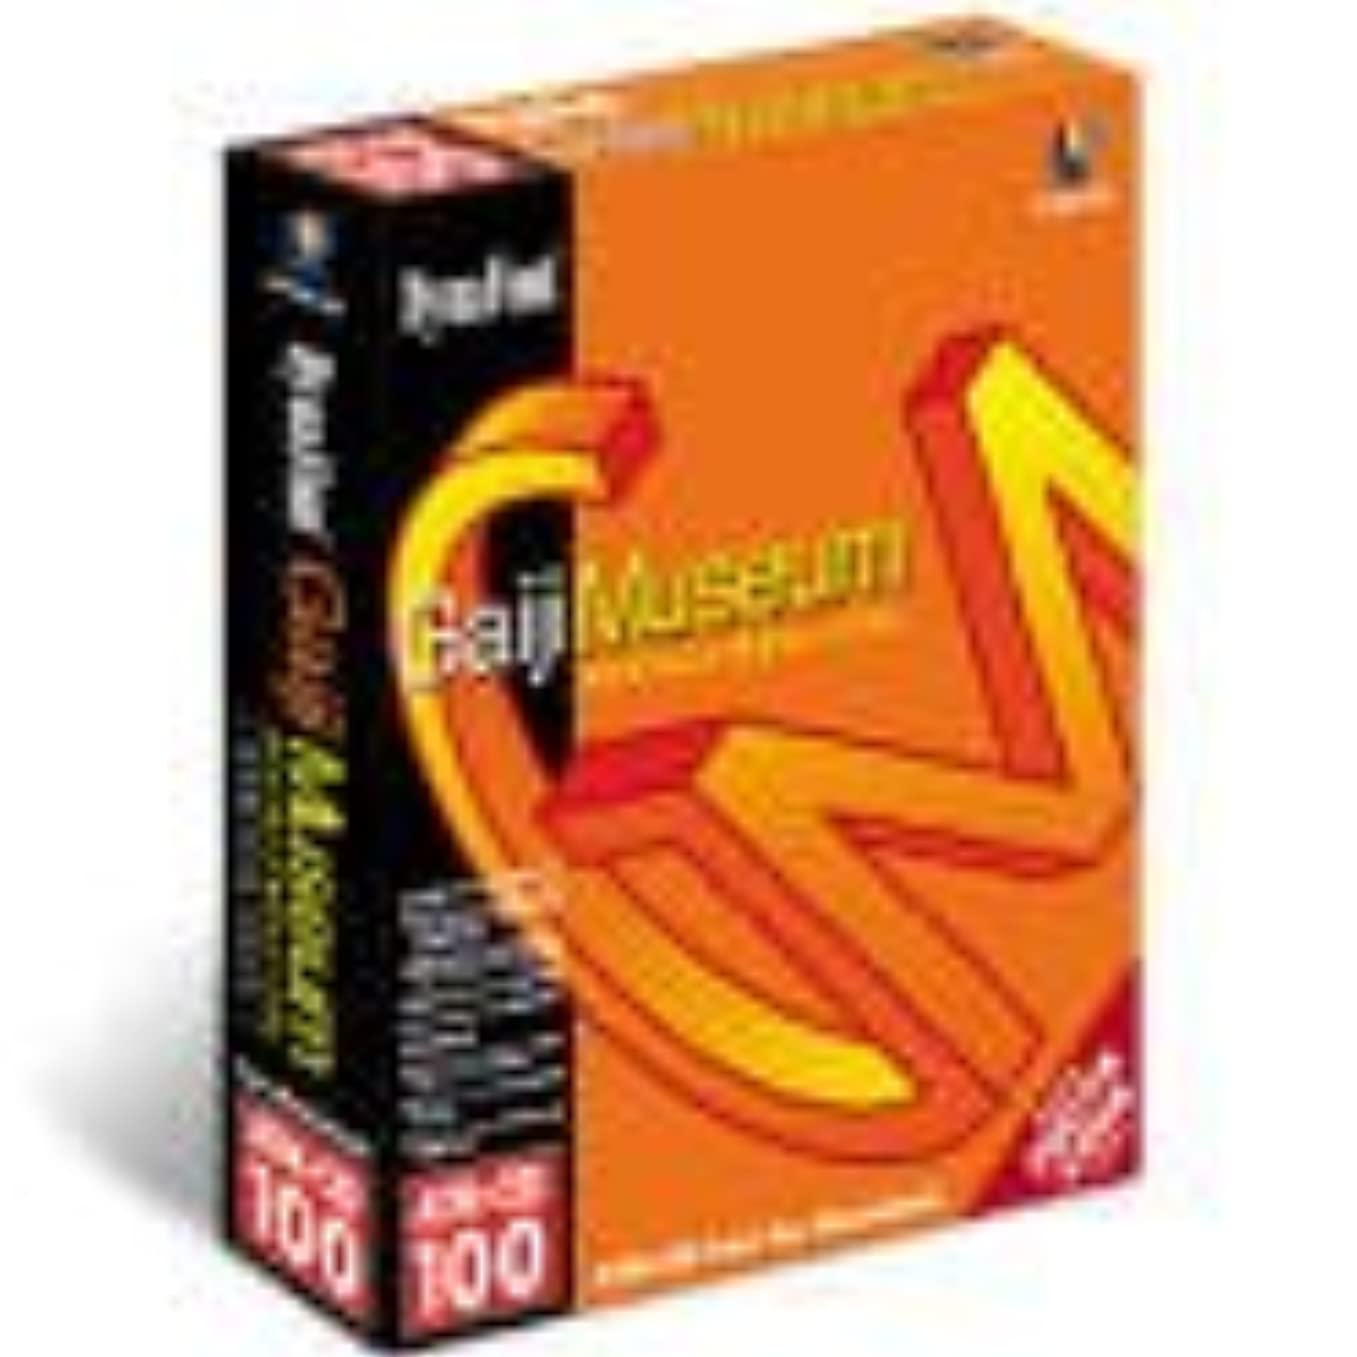 DynaFont Gaiji Museum ATM-CID 100 for Macintosh